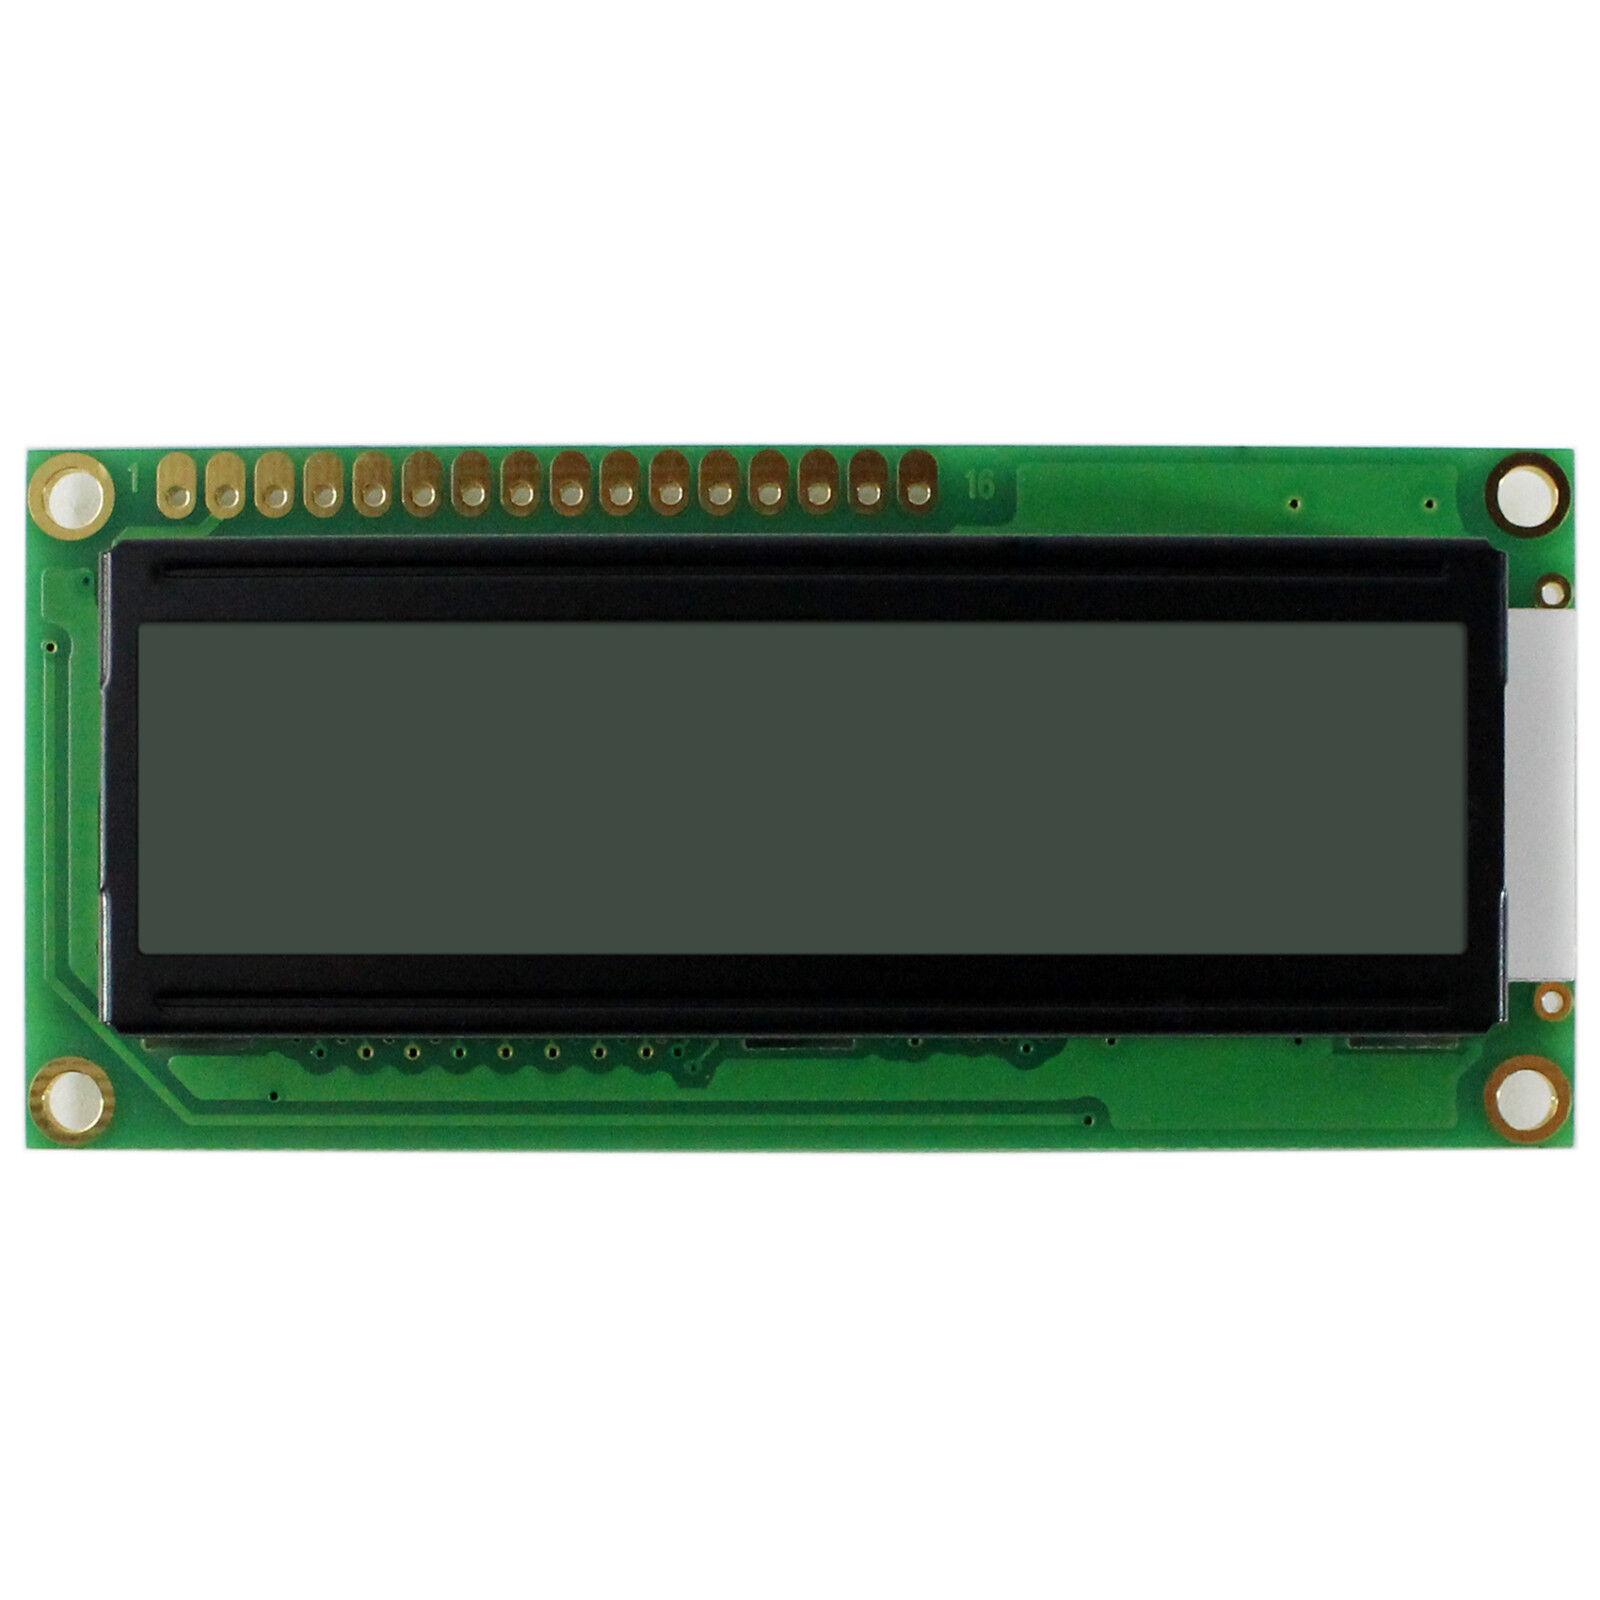 16x2 LCD Module 162 Charactrer FSTN  LCM Grey LCD Display